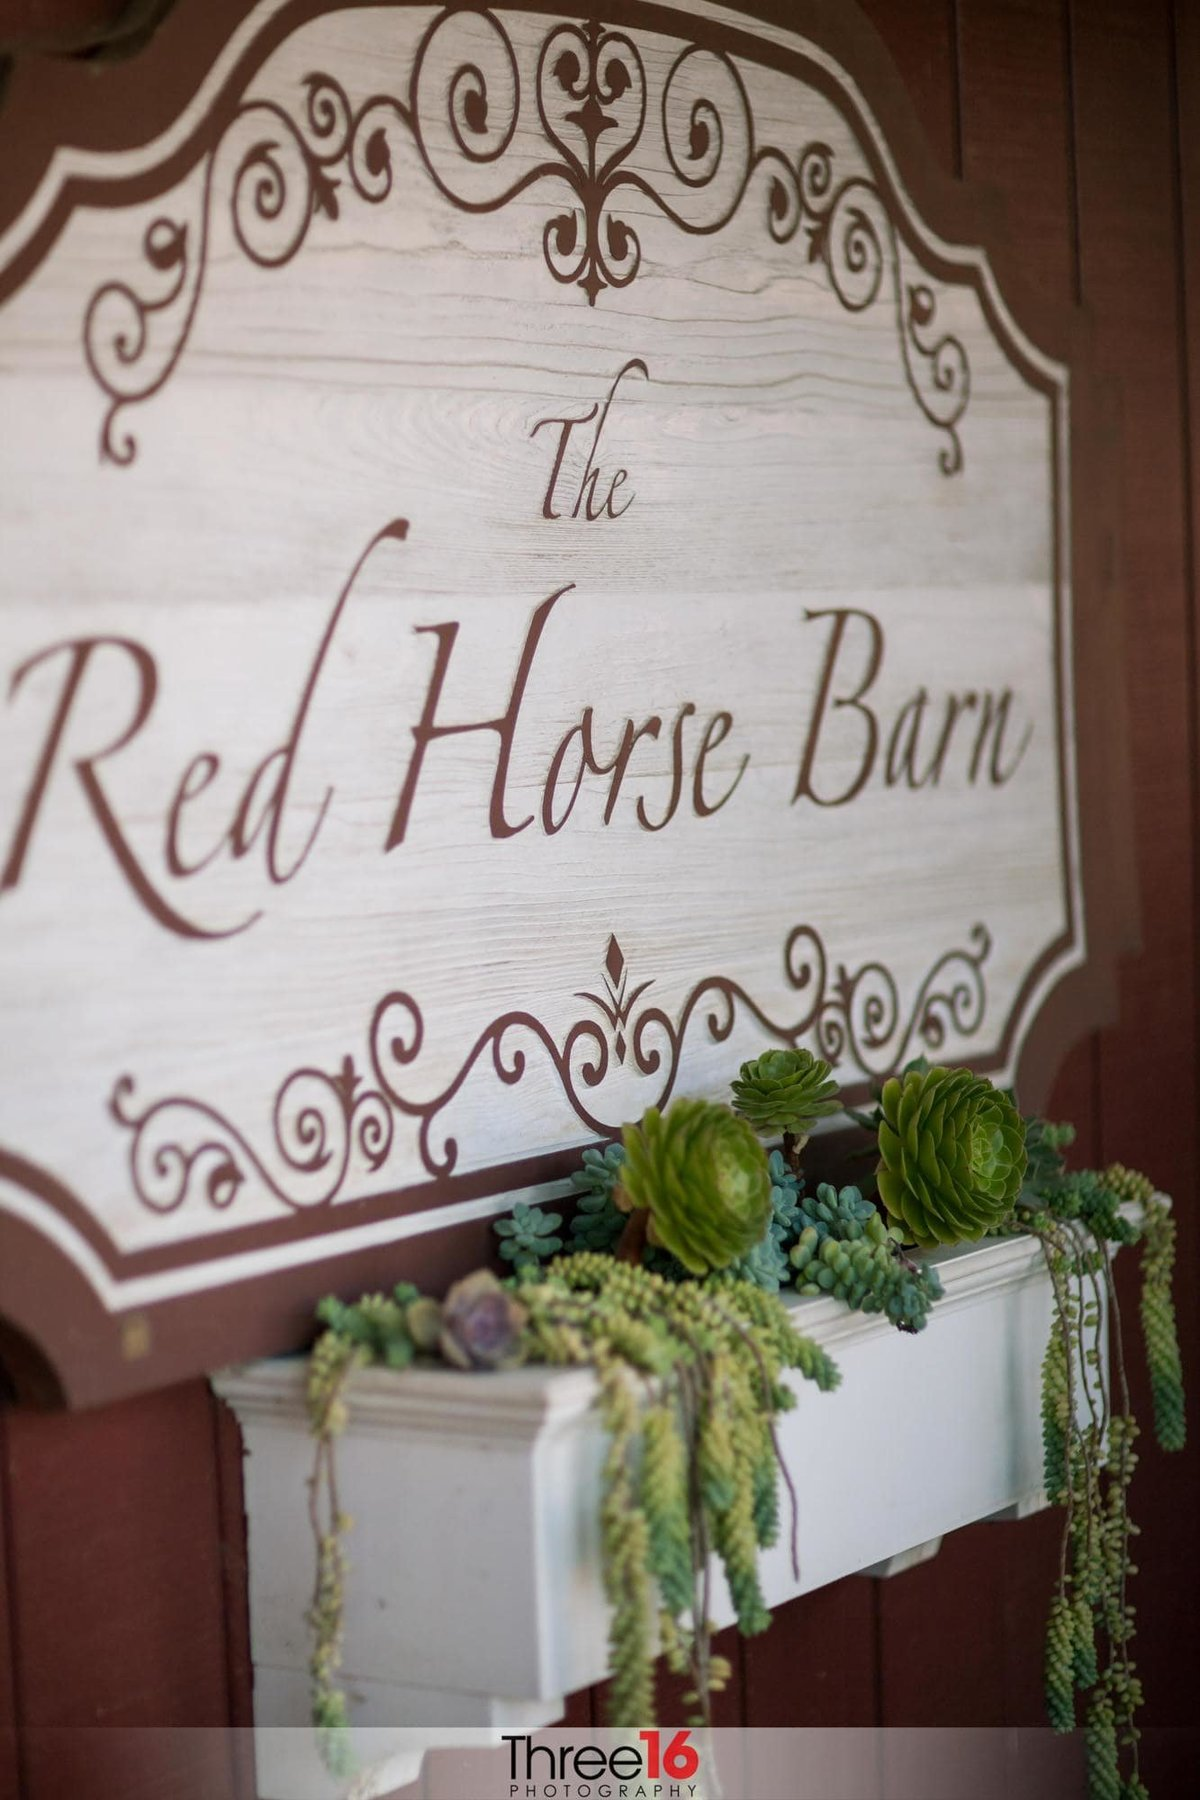 Red Horse Barn Weddings Red Horse Barn Venue